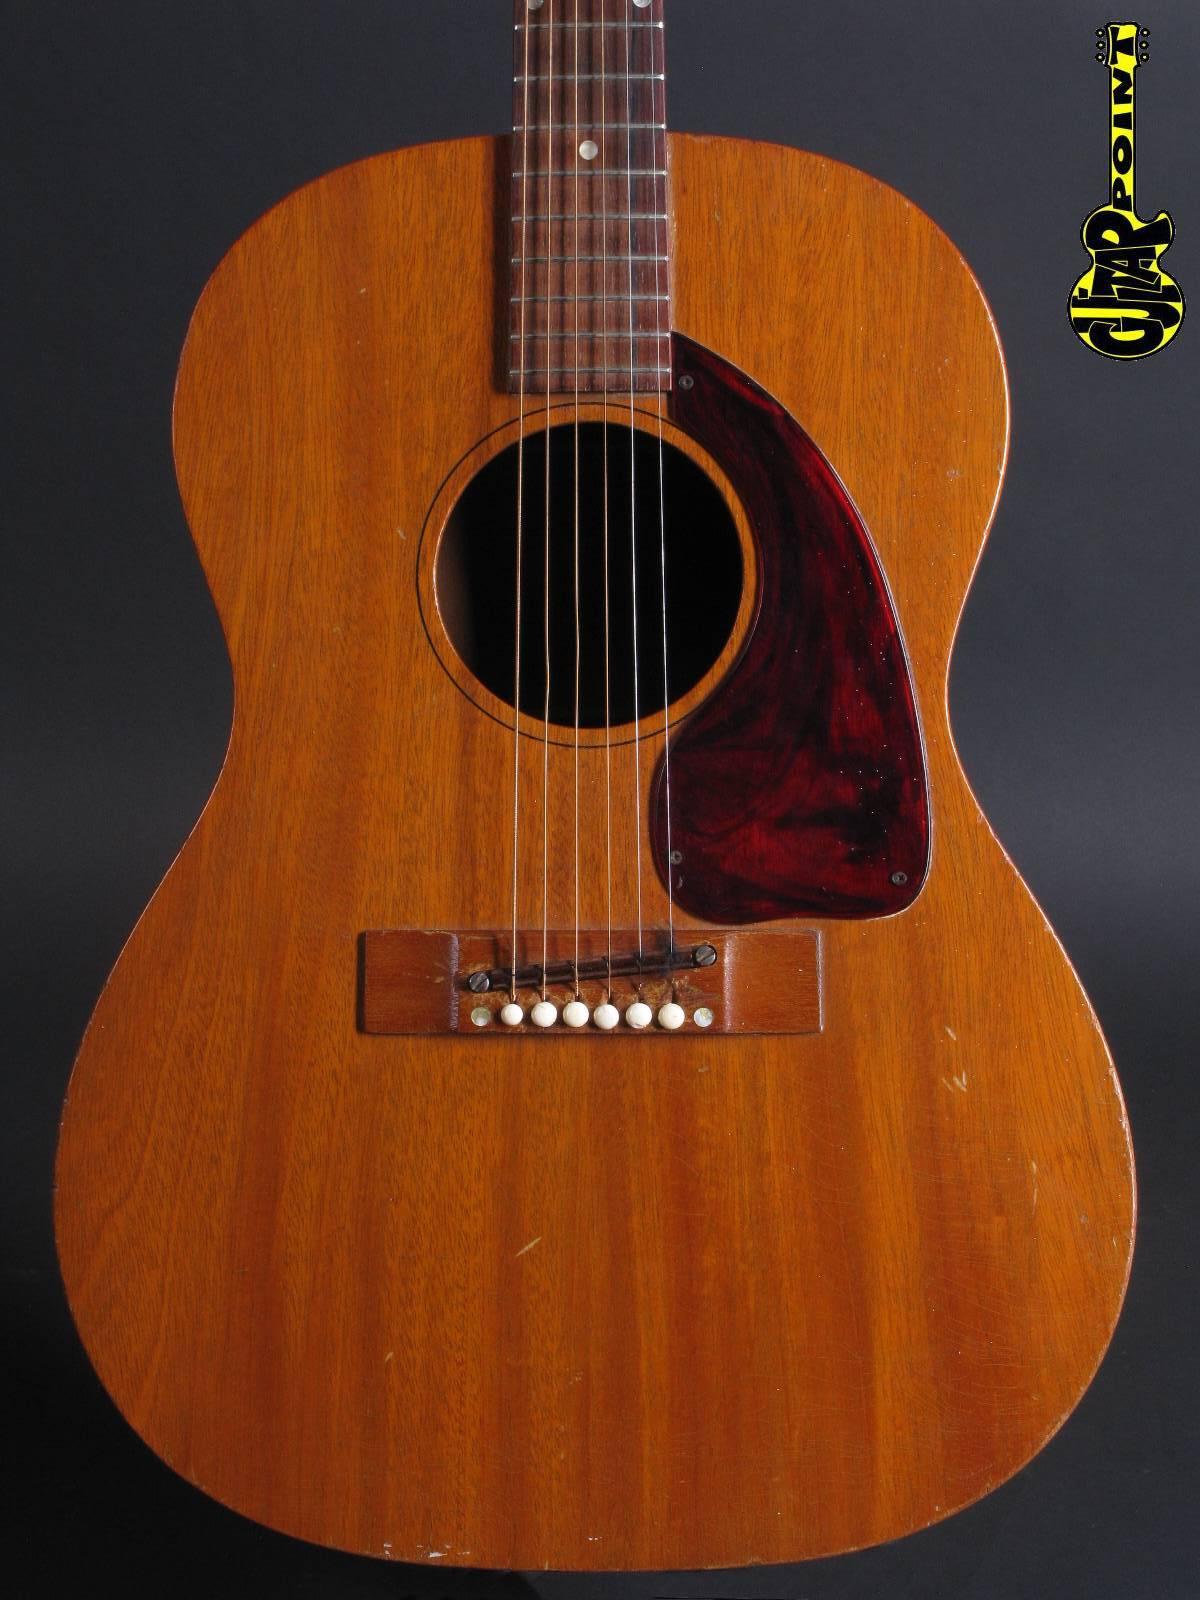 1968 Gibson B-15 - Natural